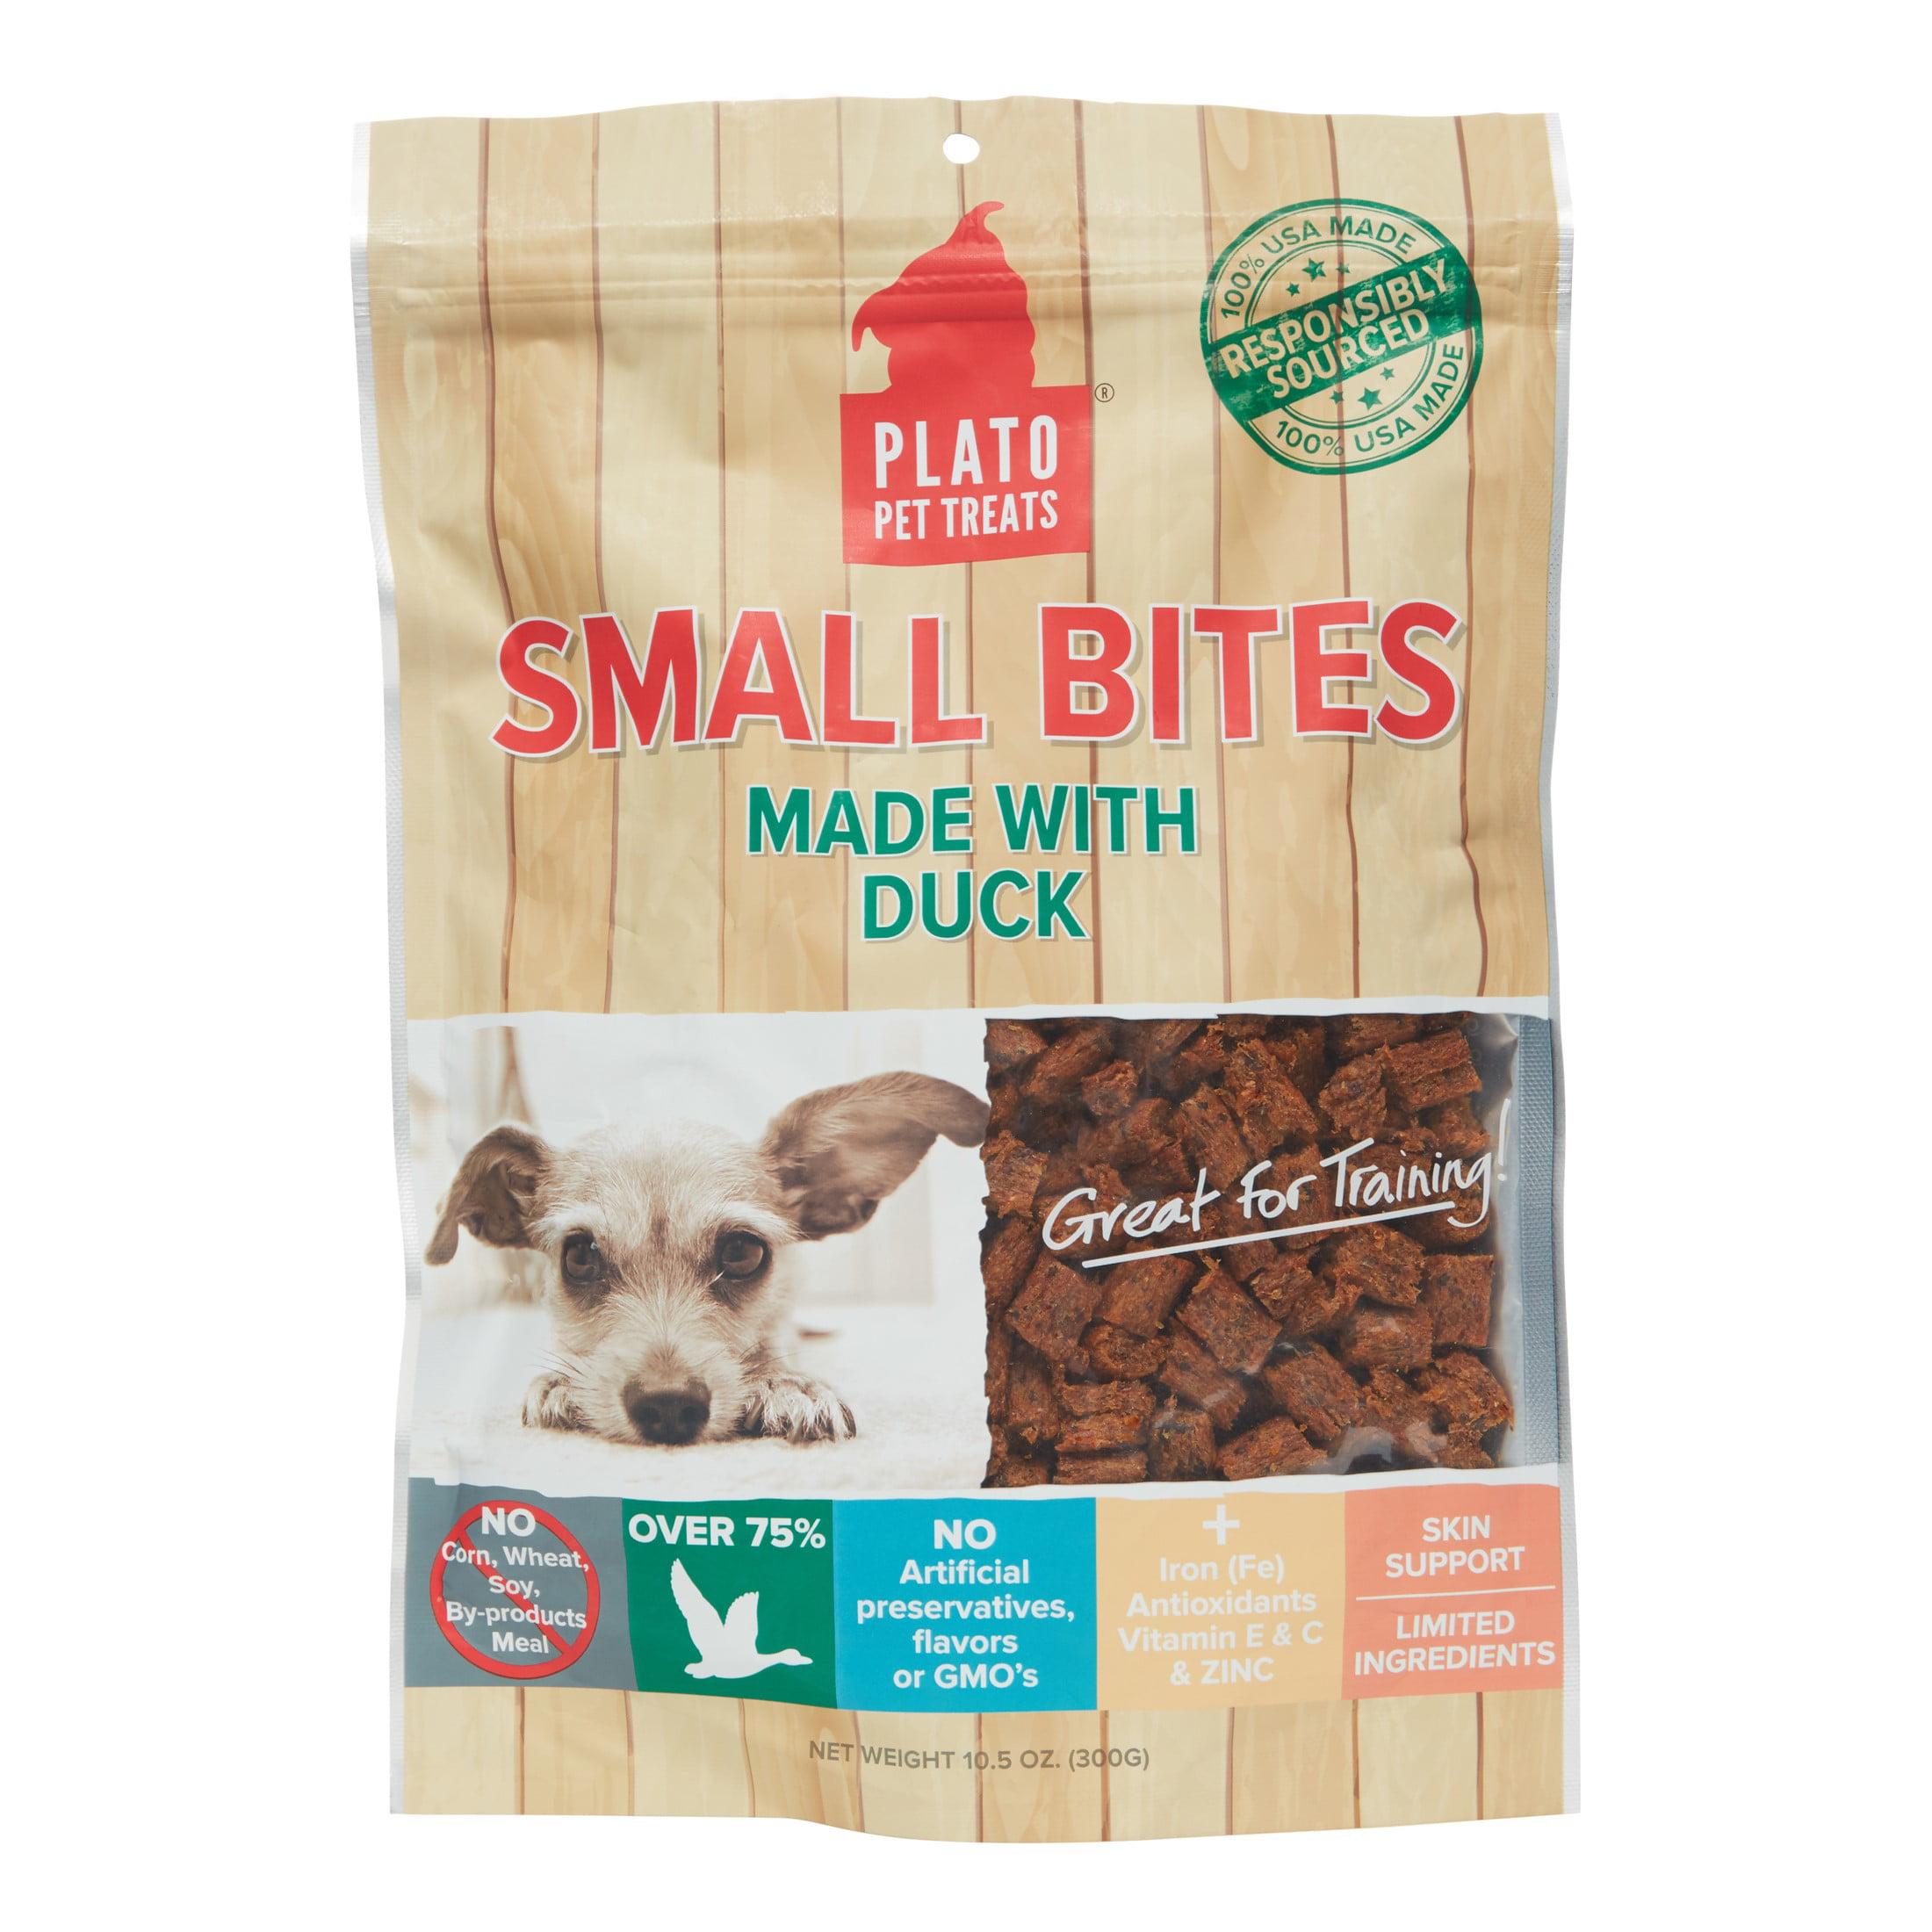 Plato Small Bites Grain-Free Duck Dog Treats, 10.5 Oz by KDR Pet Treats, LLC